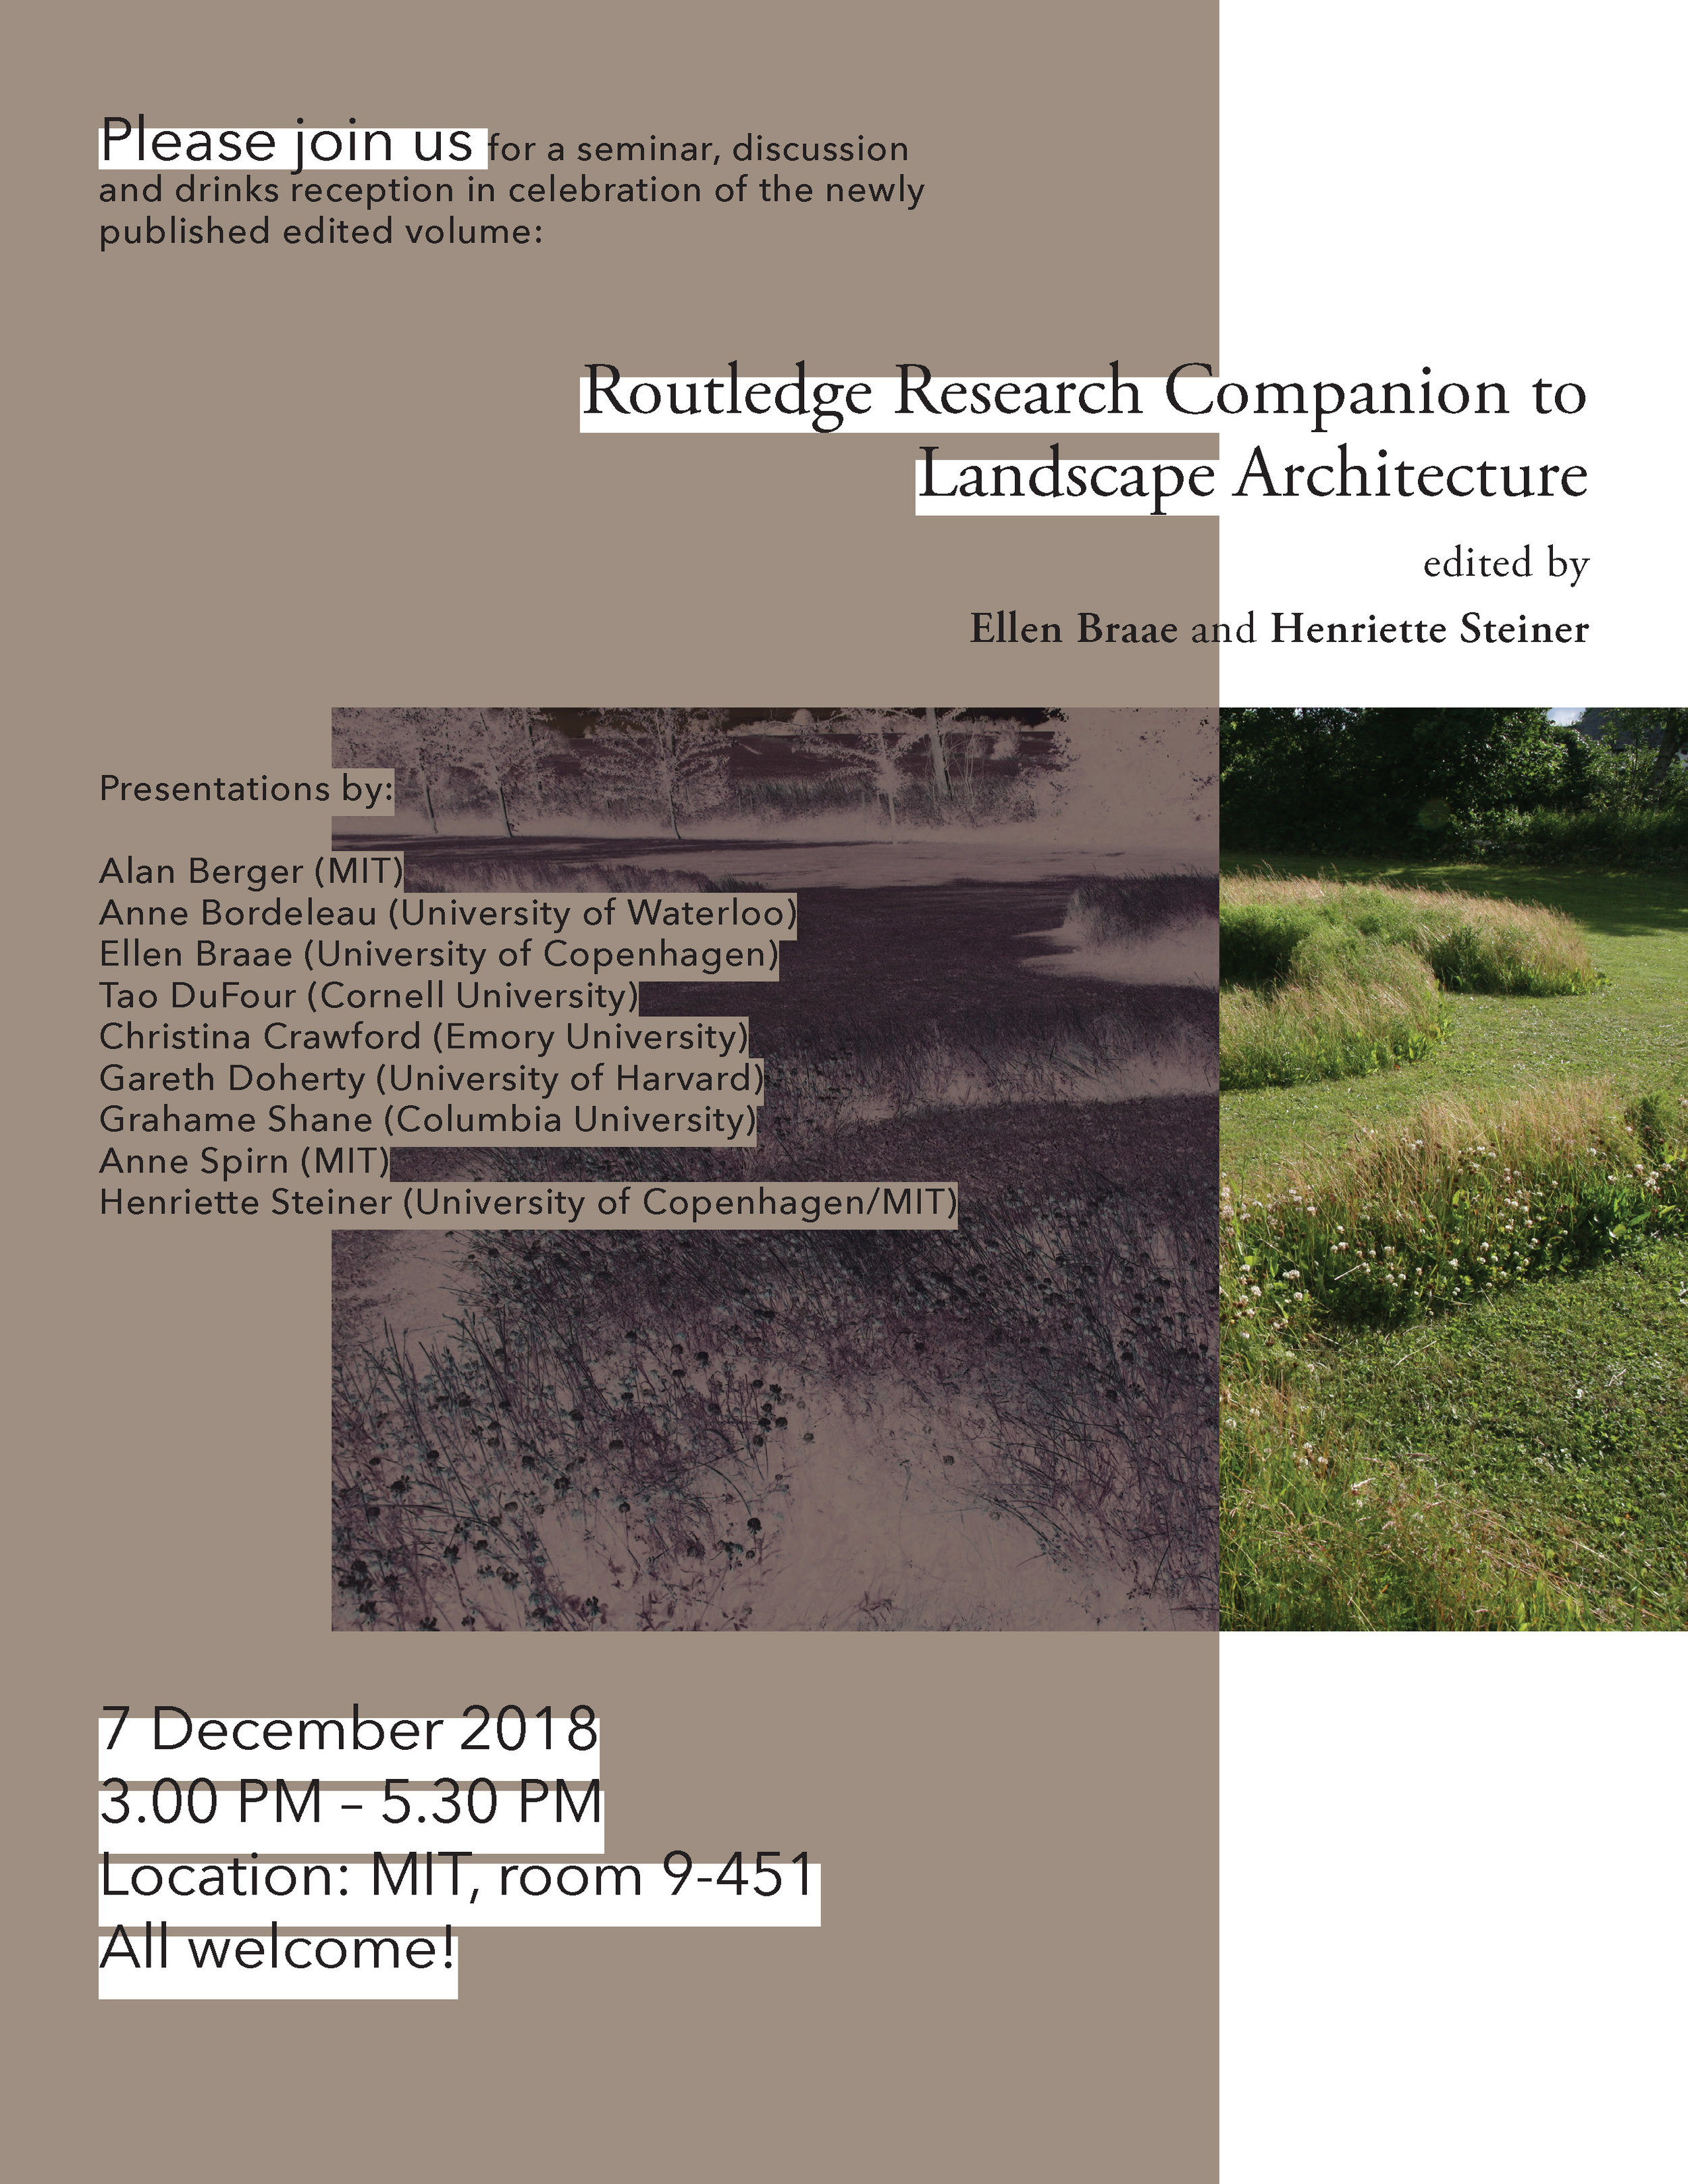 RESEARCH COMPANION TO LANDSCAPE ARCHITECURE_Symposium Flyer_12-2018.jpg